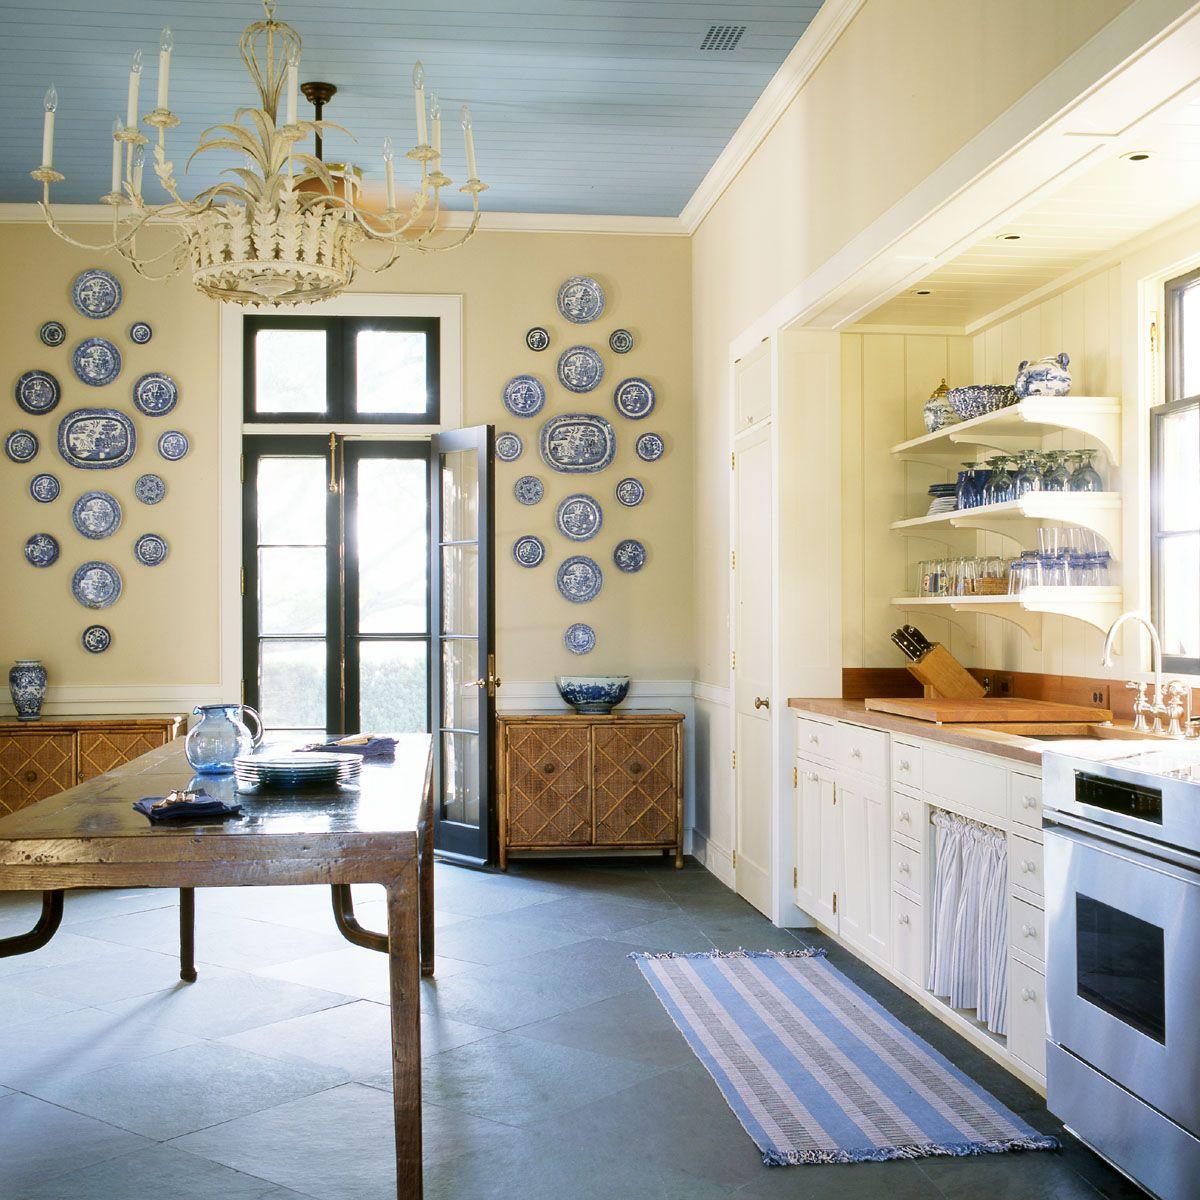 Blue And White Monday With Blue Ridge Farm Kitchen Window Blue